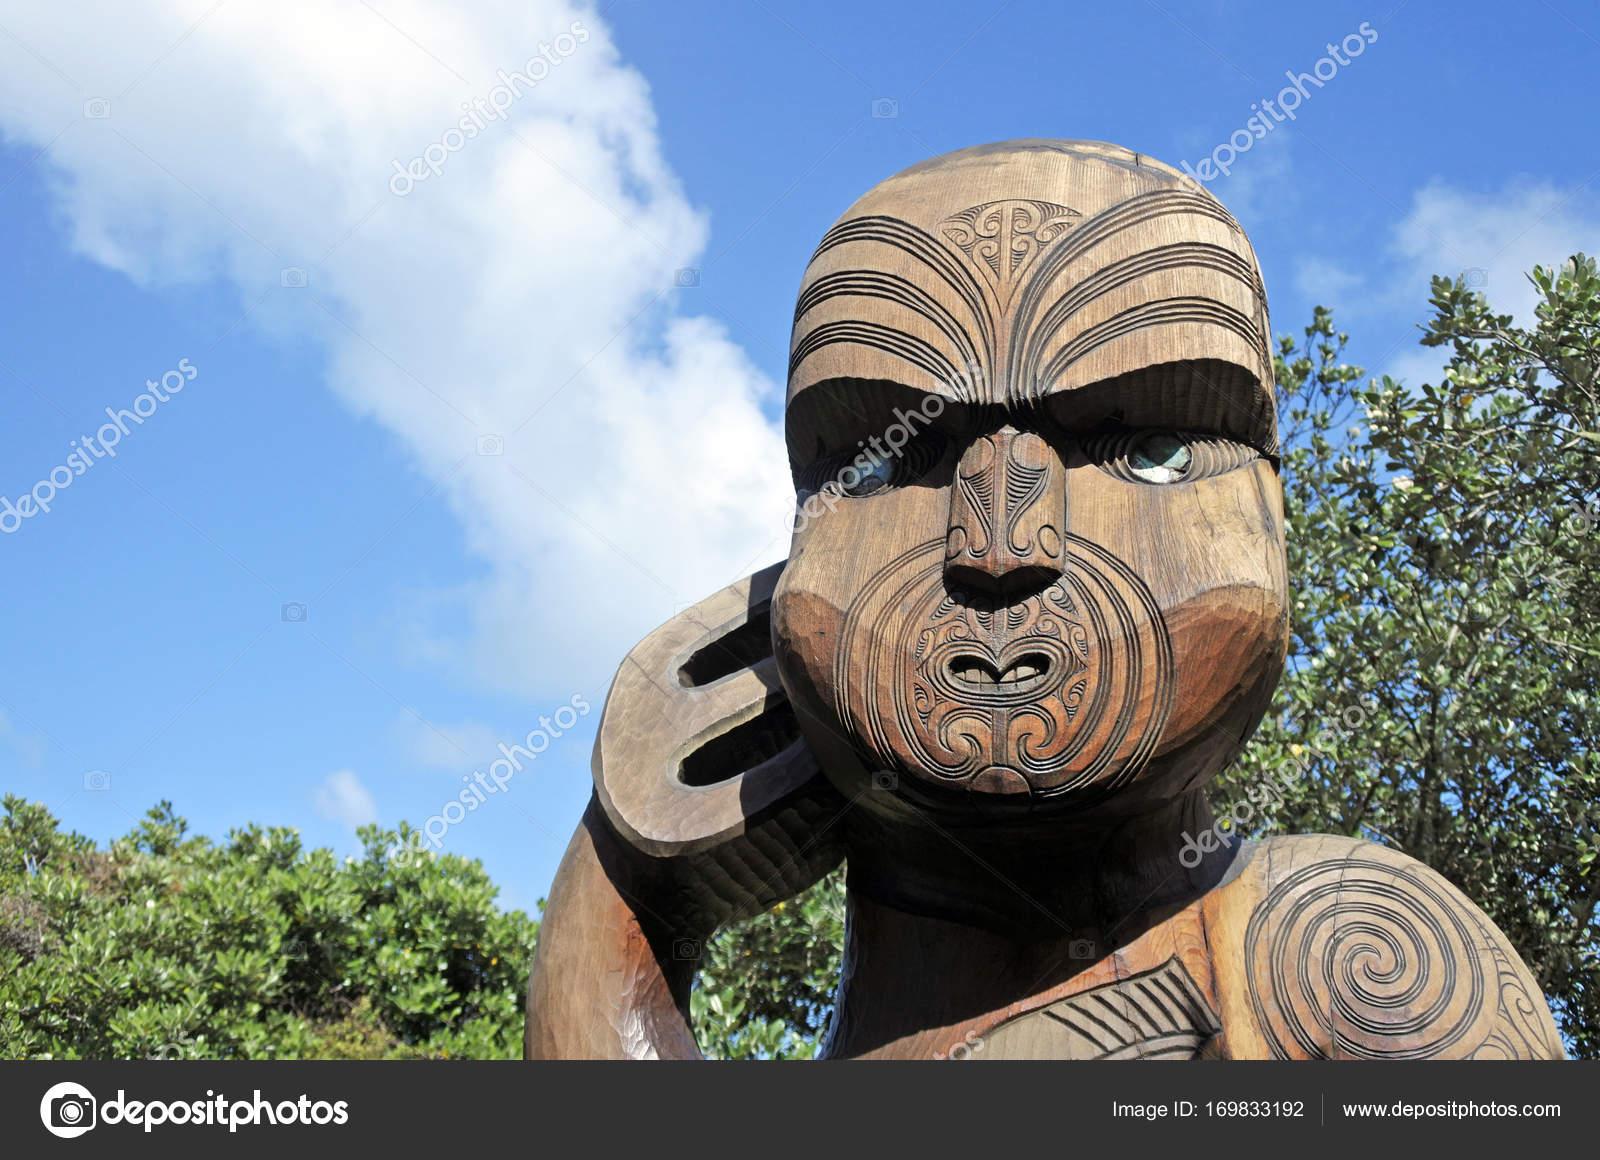 Picturesque Maori Krieger Photo Of Holzschnitzerei Statue — Stockfoto